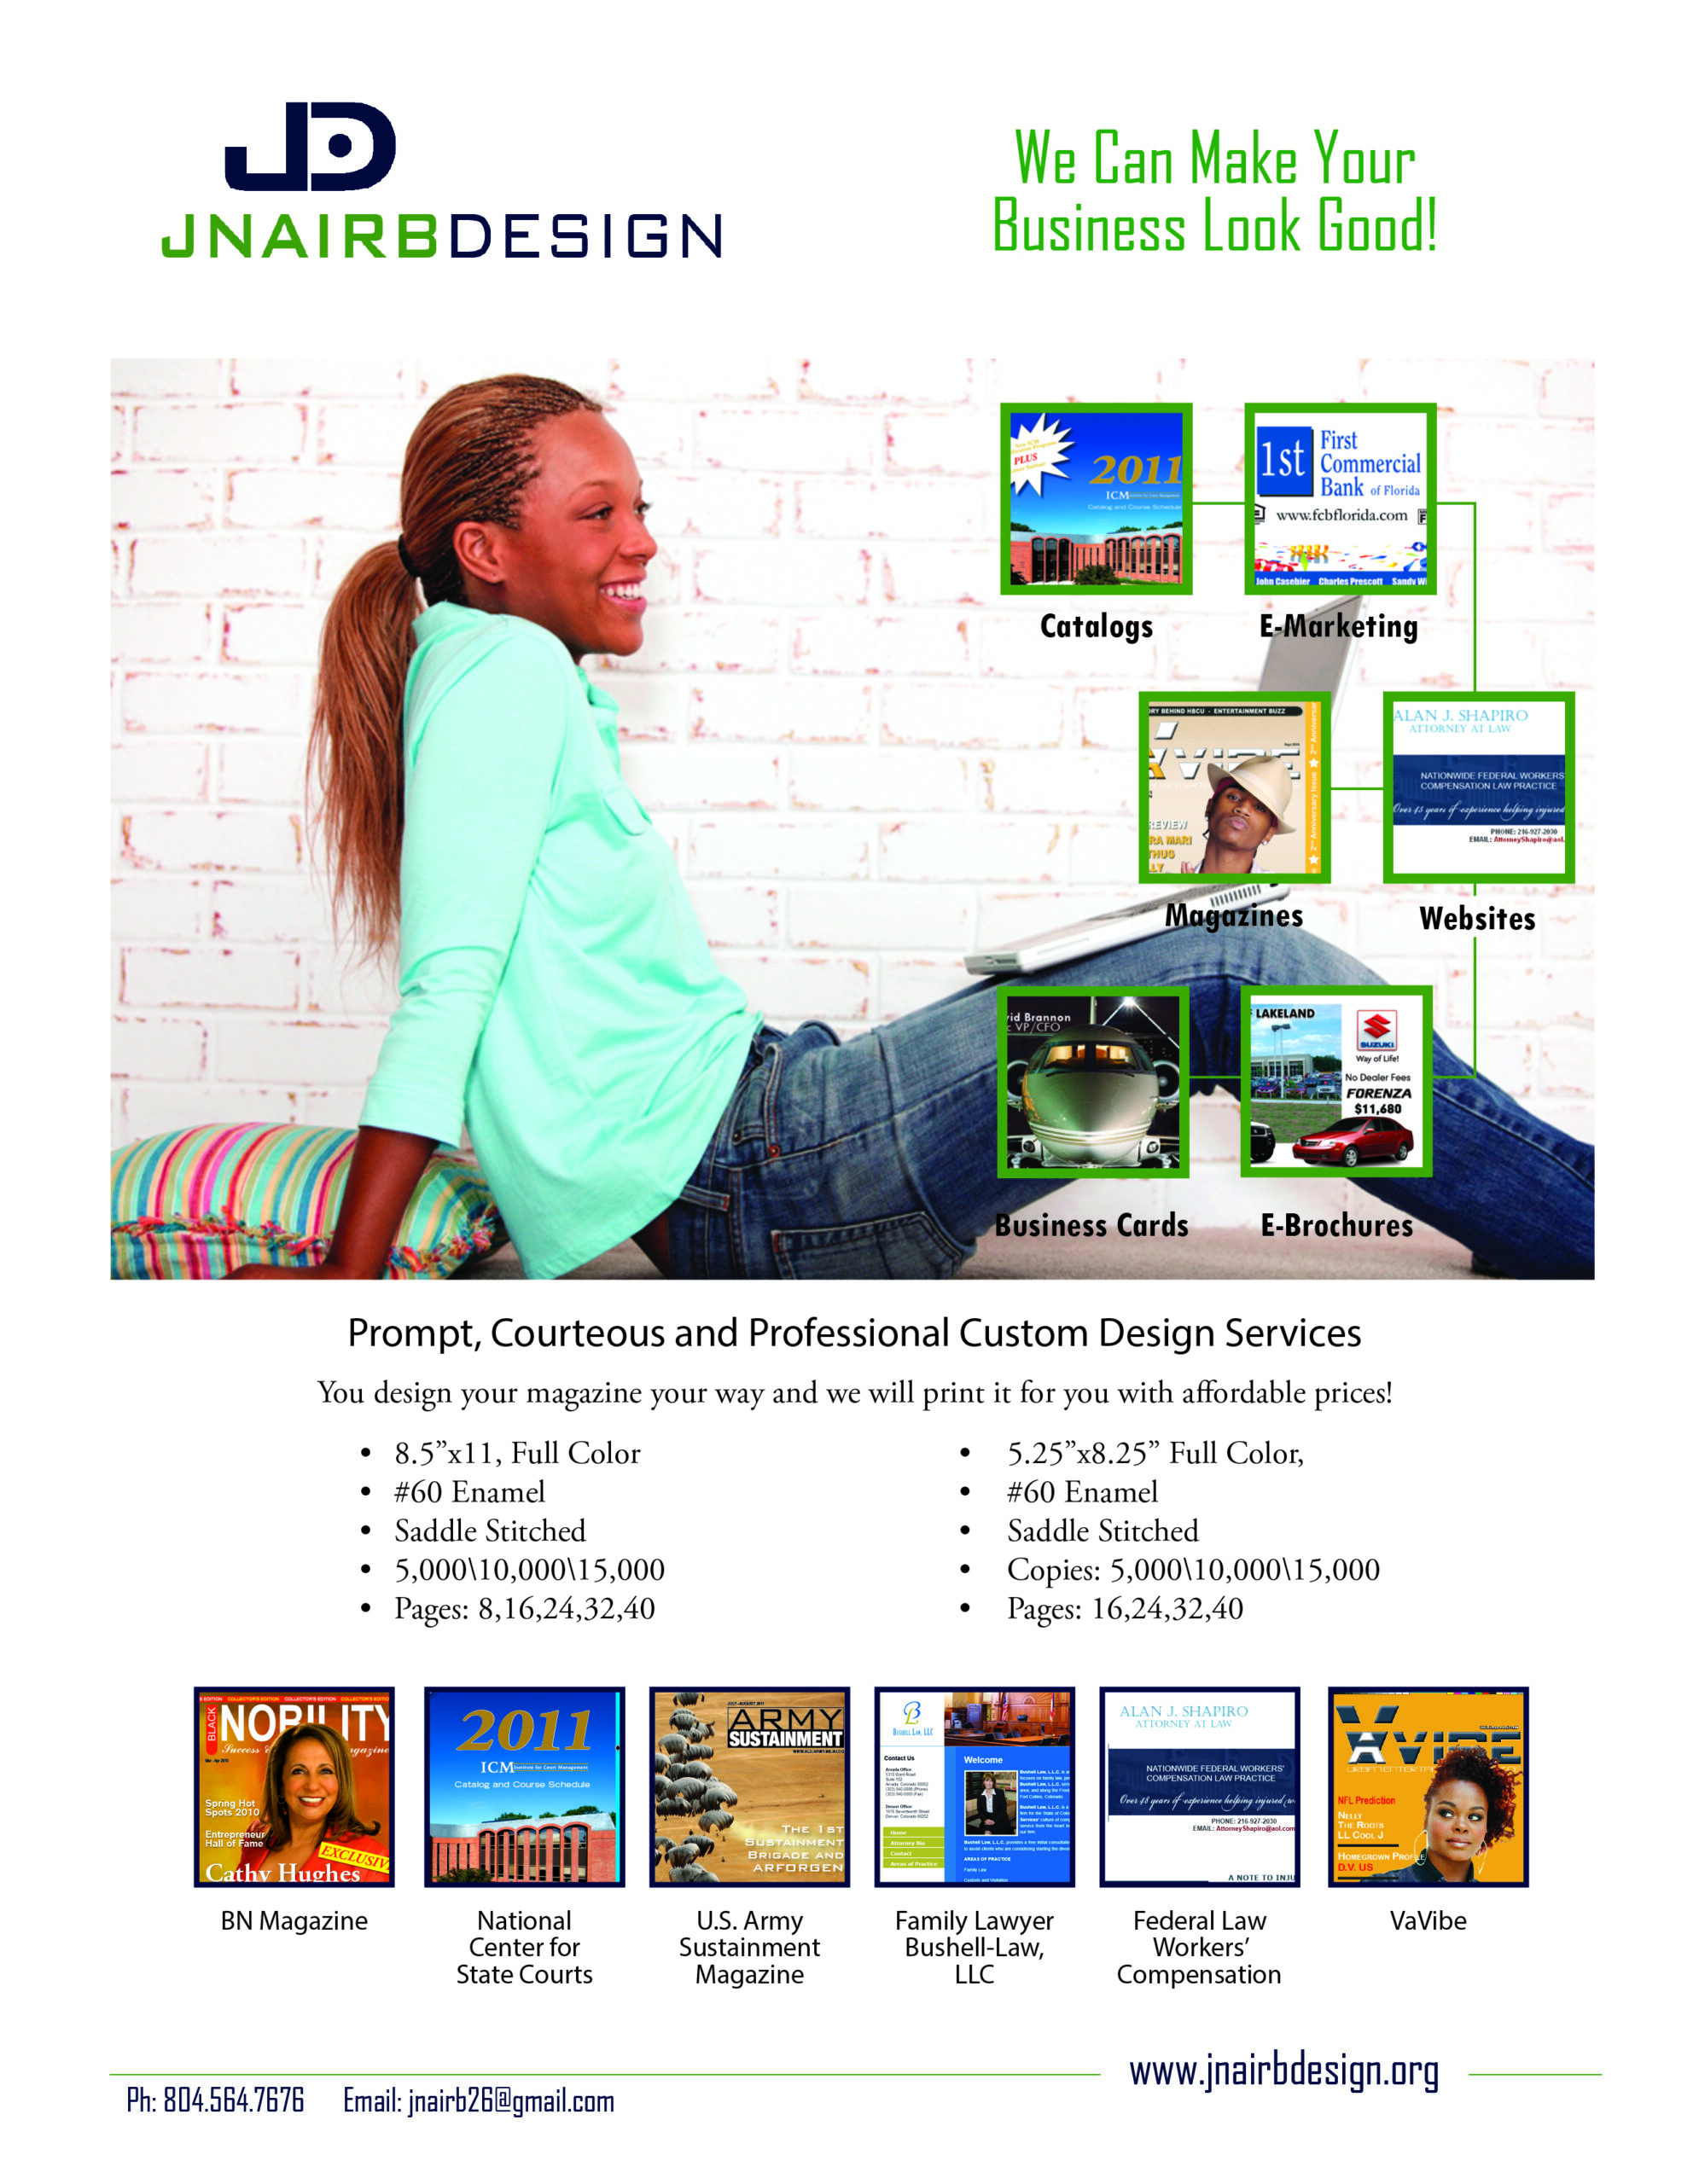 Prompt Courtous Professional Custom Design Services